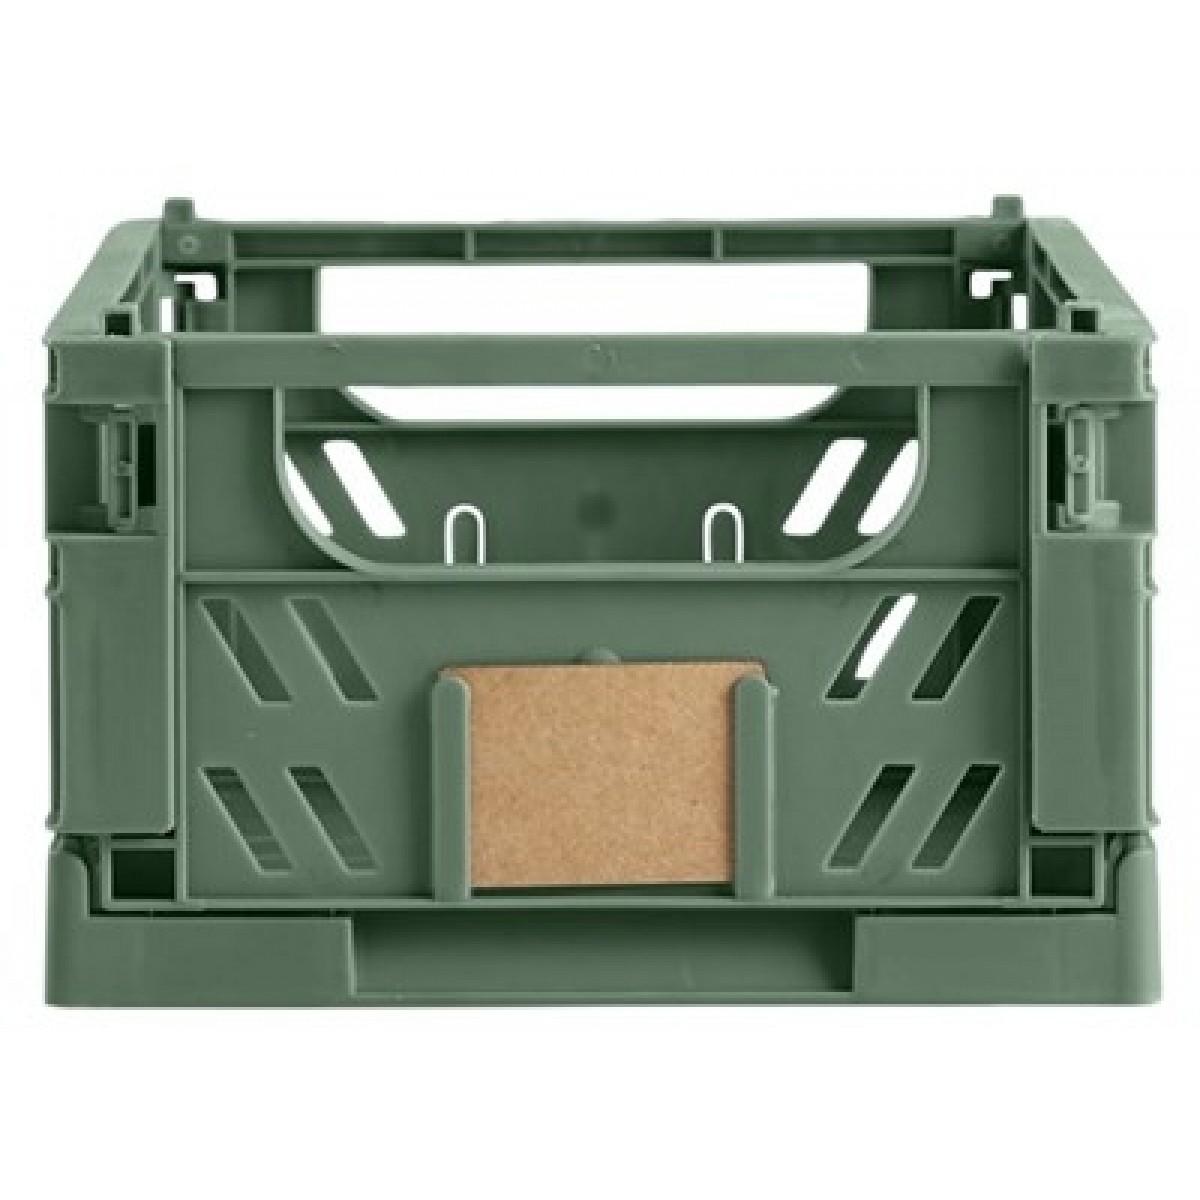 DAY Opbevaringskasse foldbar 25x16,5x10 cm dill green